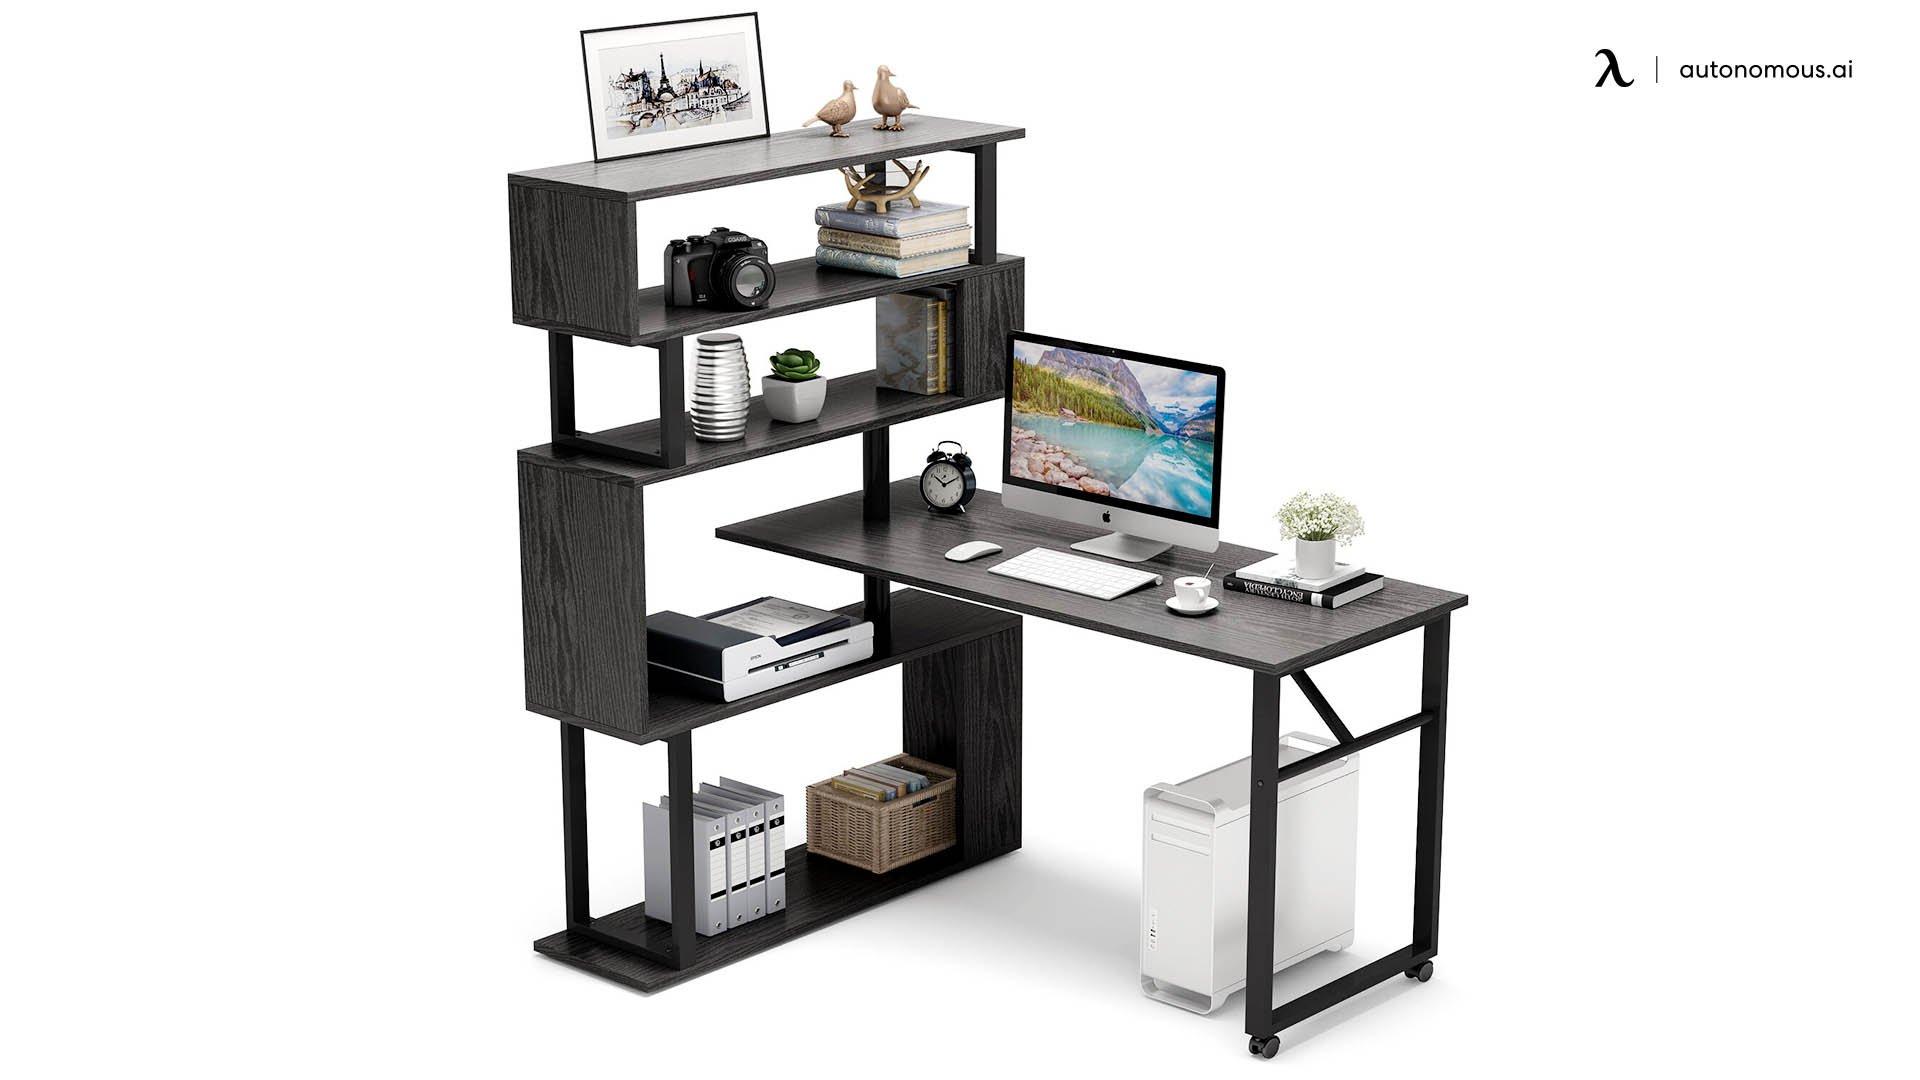 Inbox Zero Reversible L-shaped Desk